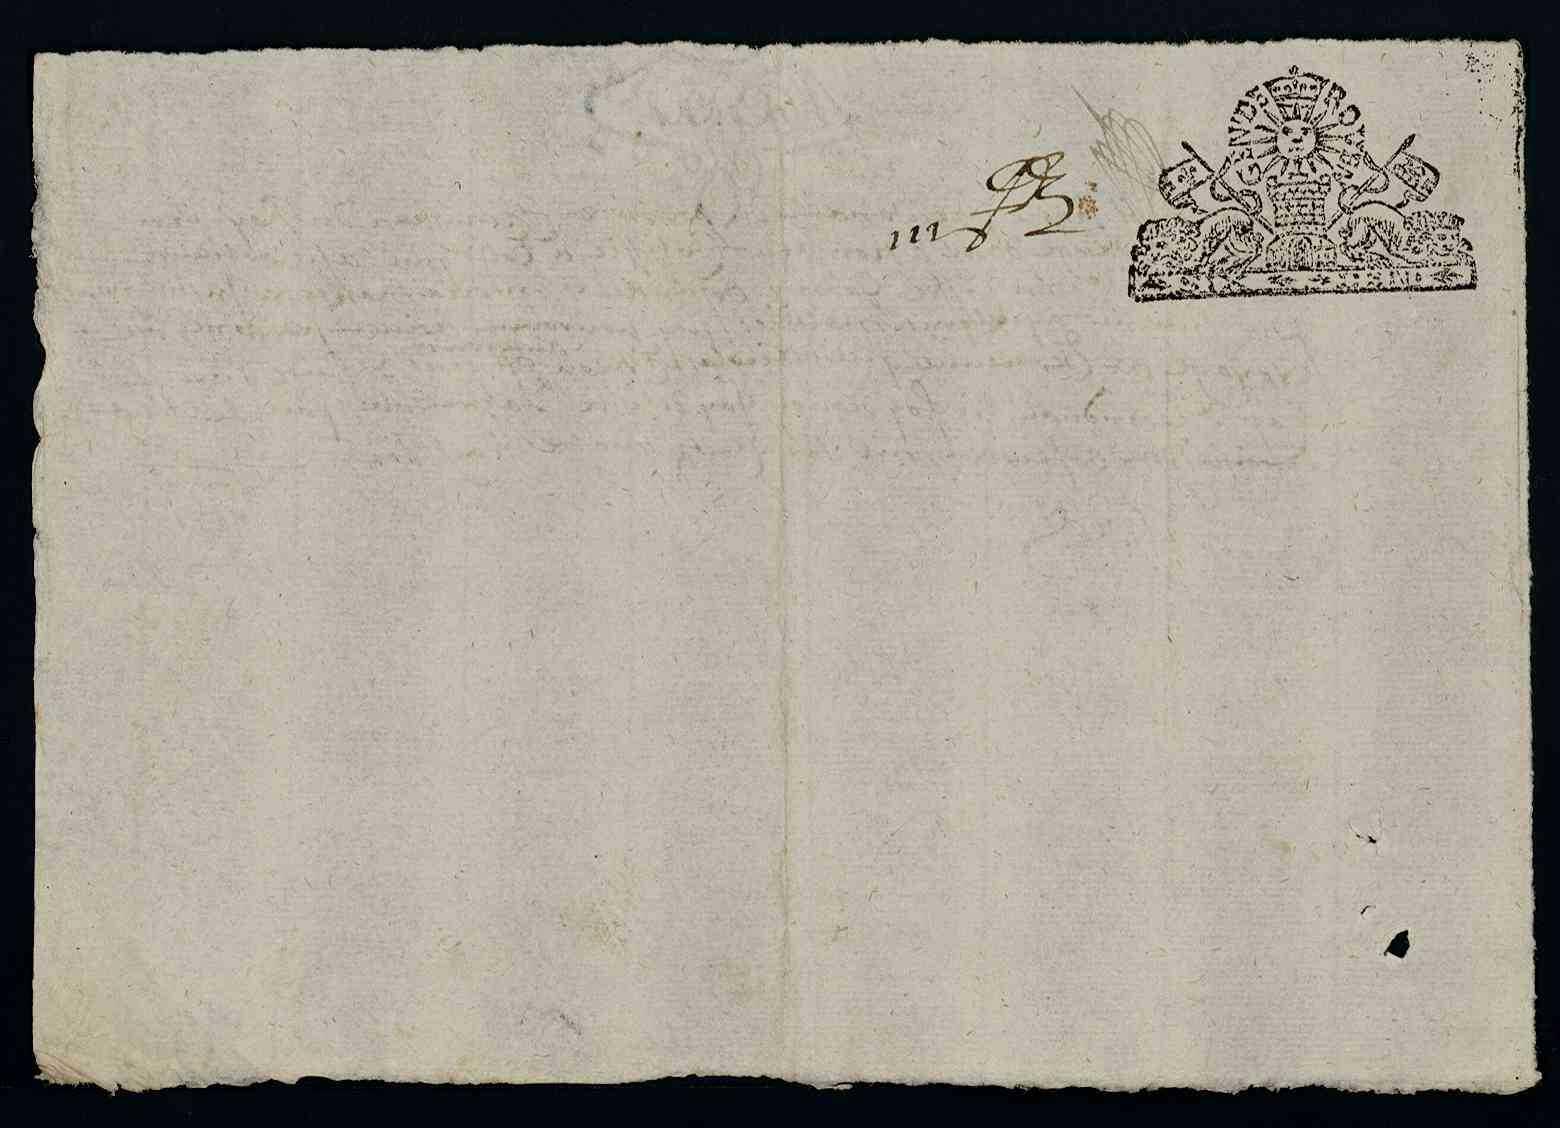 22 février 1686-23 février 1686